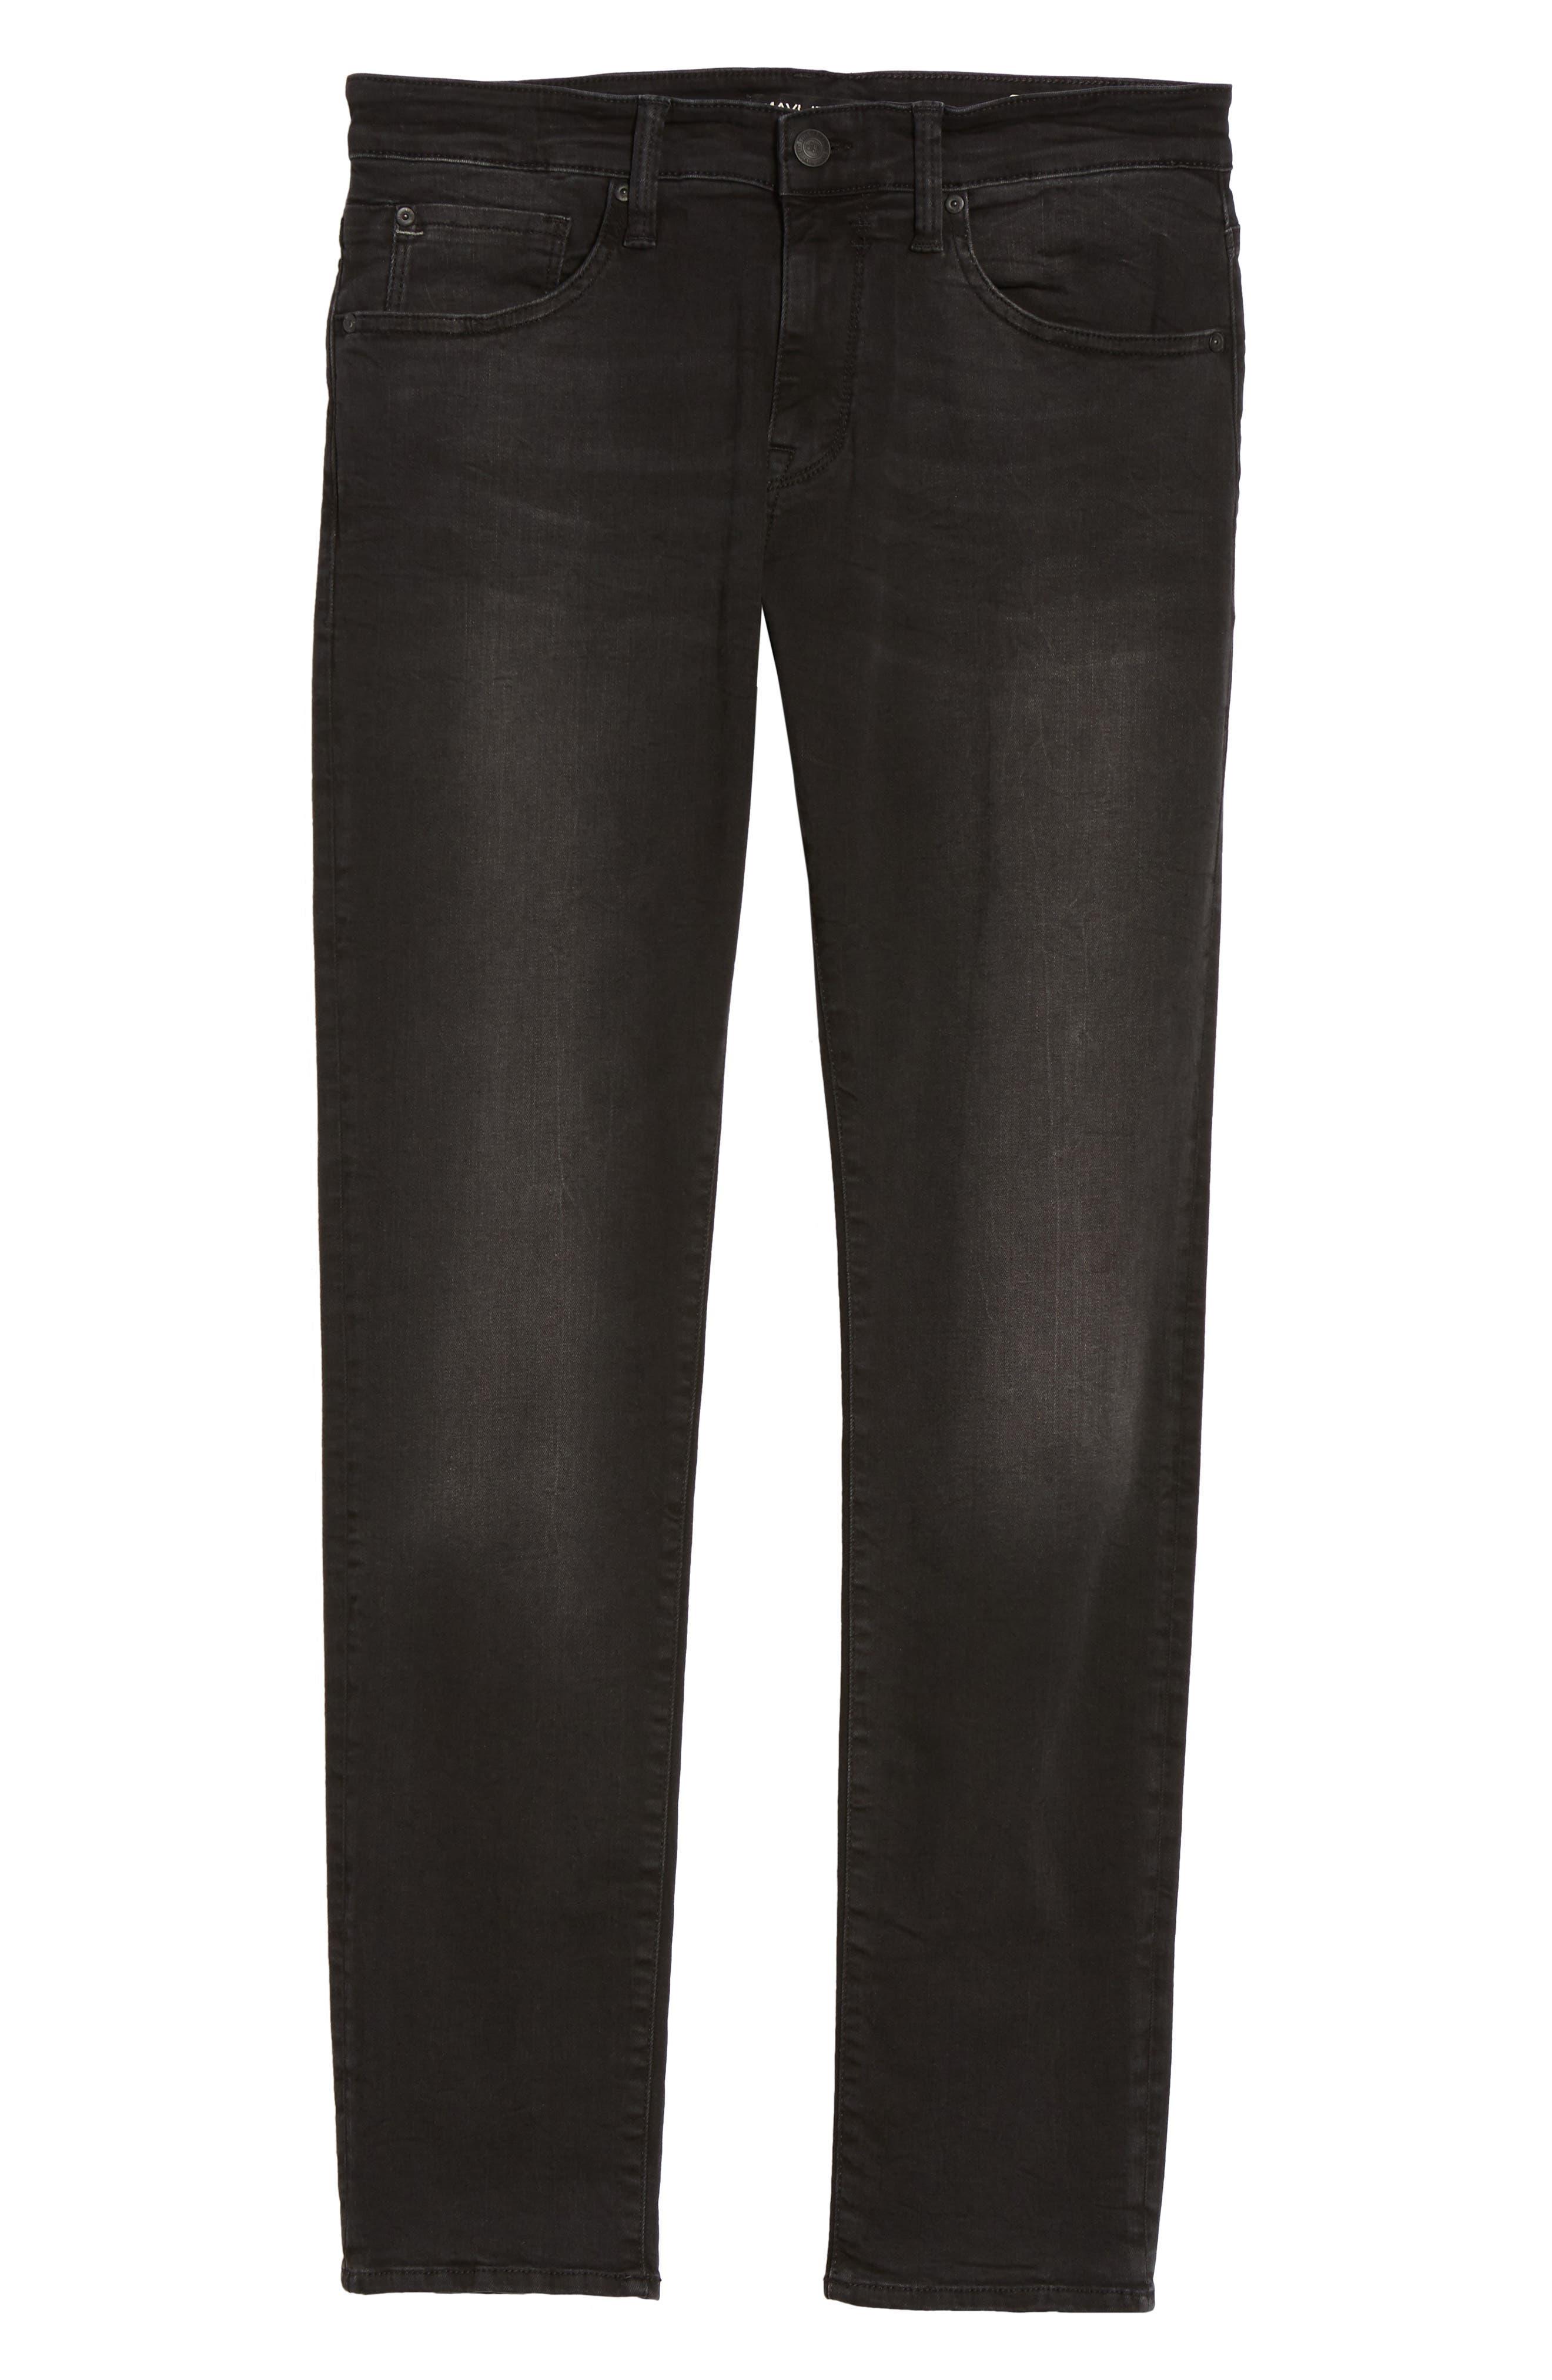 Jake Slim Fit Jeans,                             Alternate thumbnail 6, color,                             020